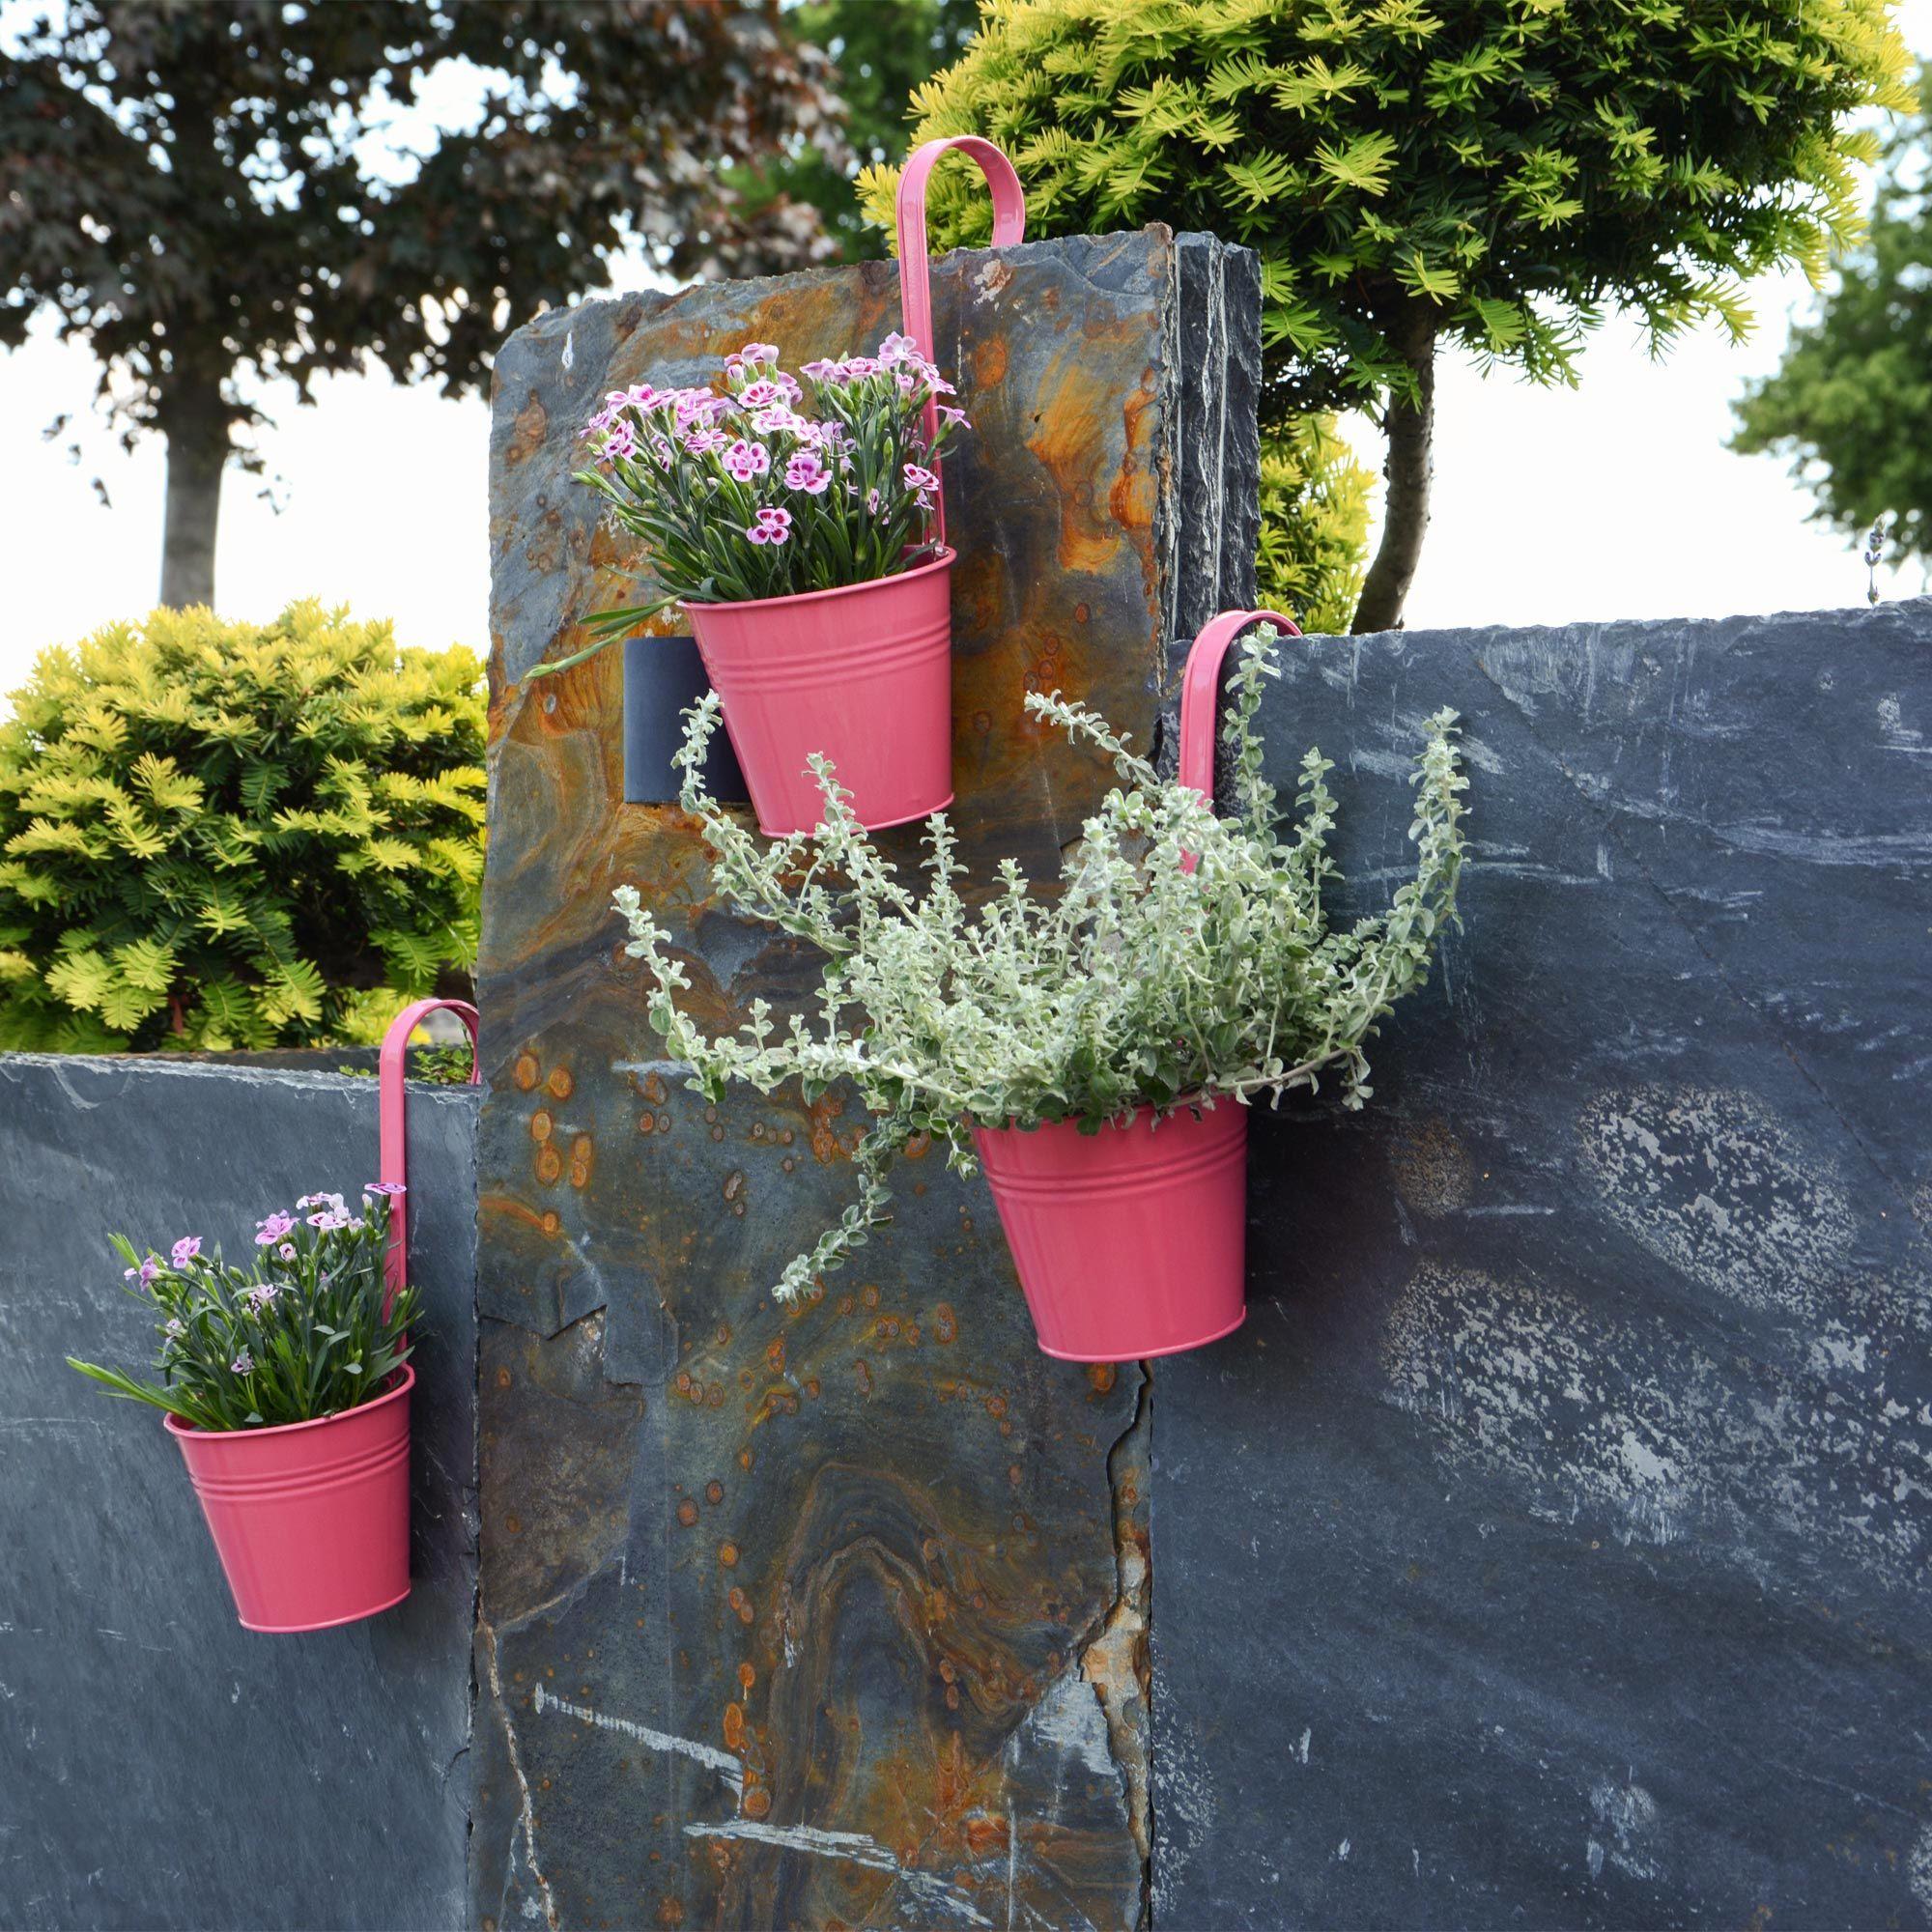 Hangetopf Set Pink Metall Blumen Garten Zaun Gartendekoration Aufhangen Krautergarten Blumenbeet Gartendekoration Blumentopf Hangetopf